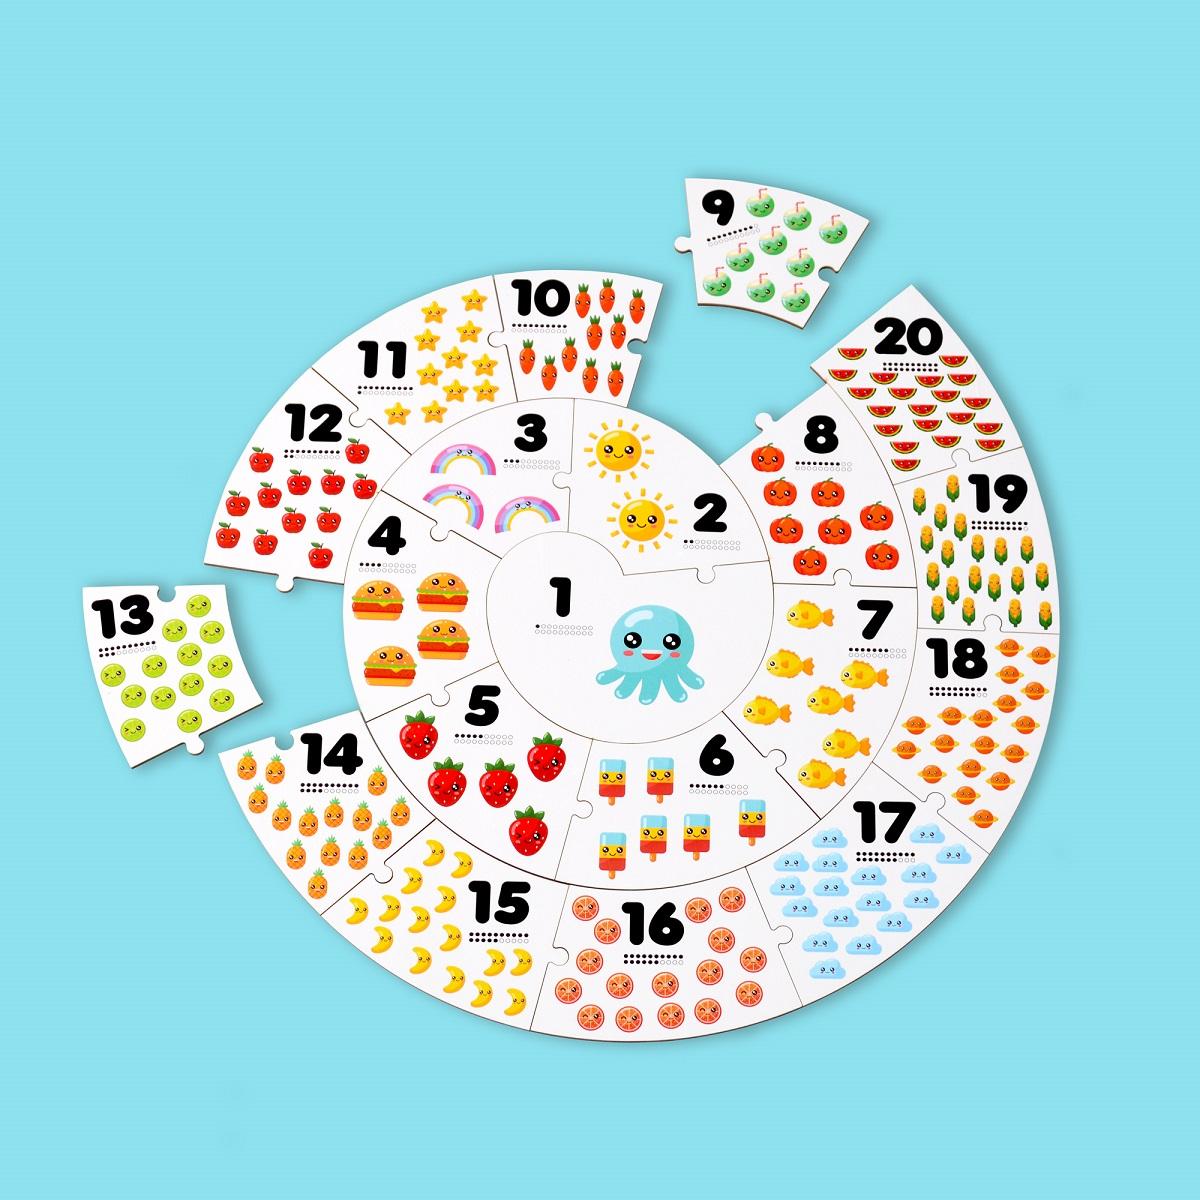 Brinquedo Educativo Montessori Quebra Cabeça Conte Ate 20